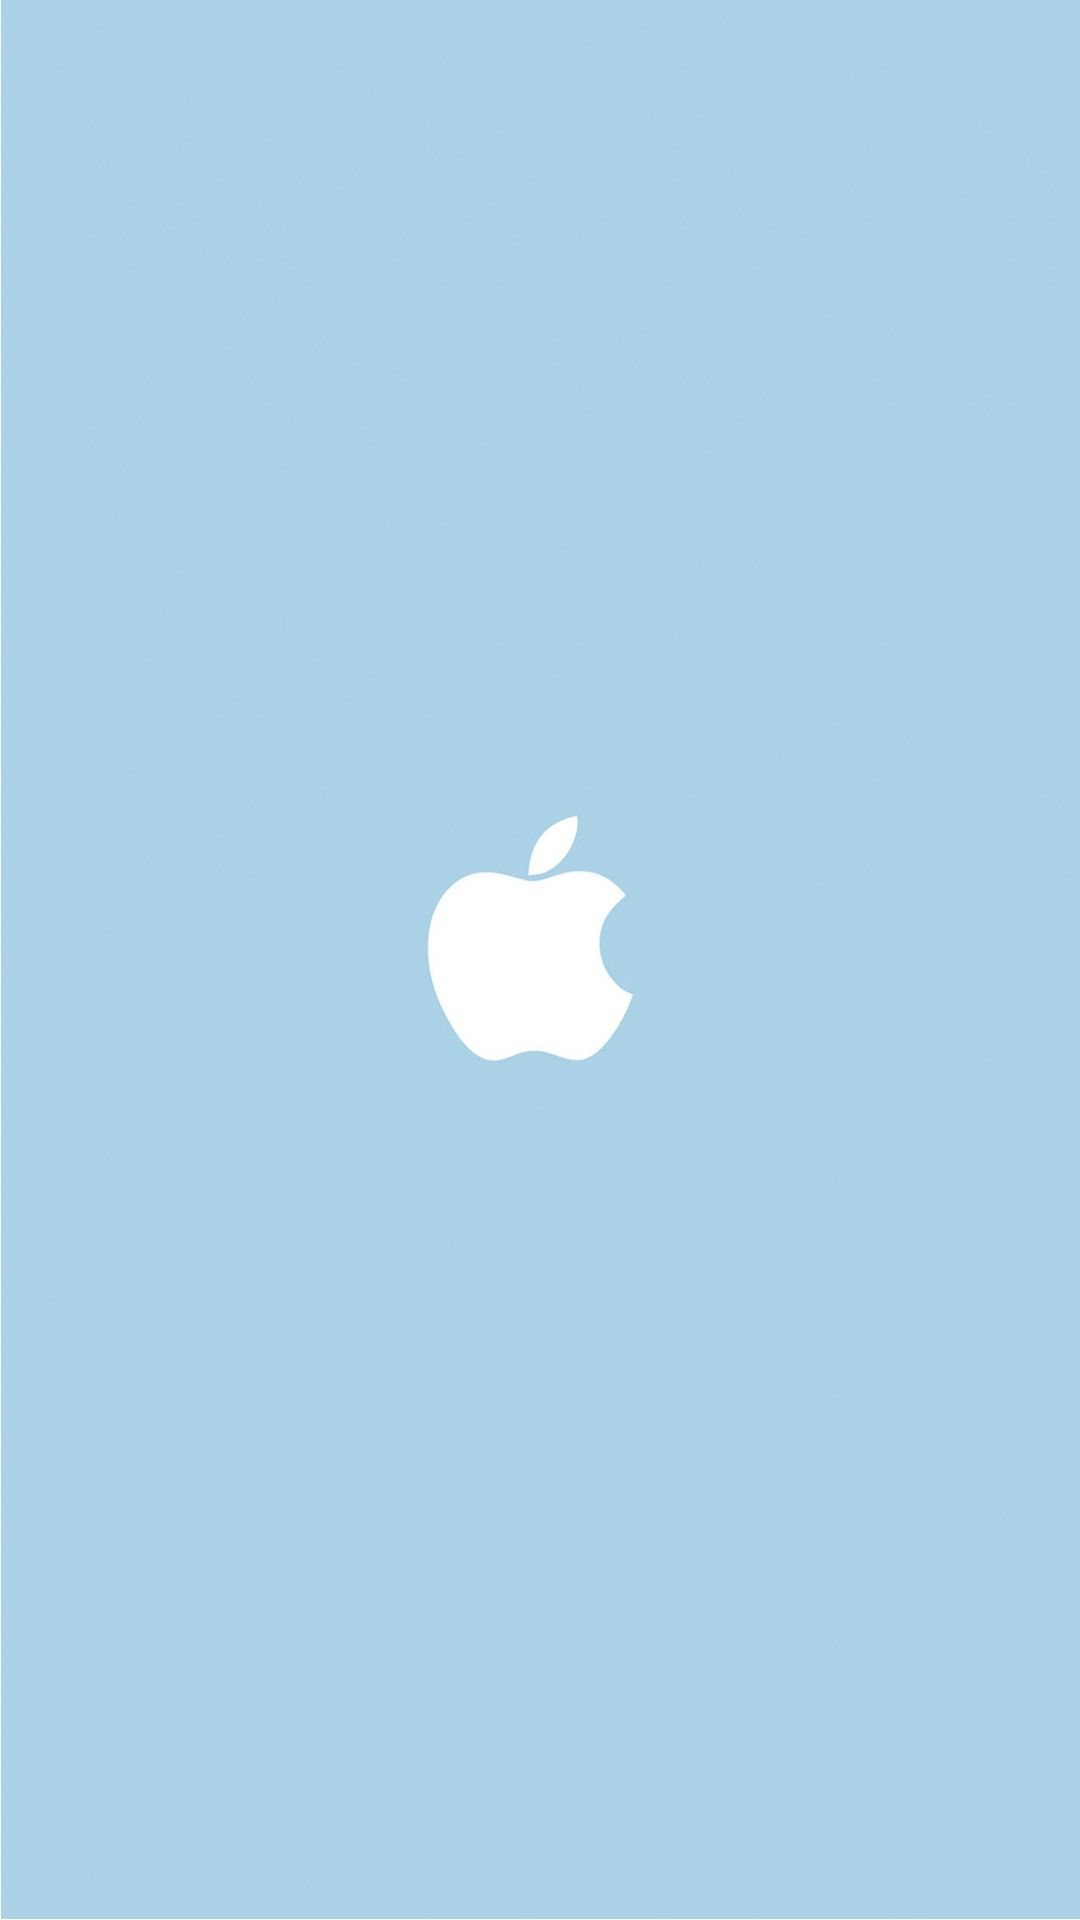 71 best free apple logo iphone wallpapers - wallpaperaccess